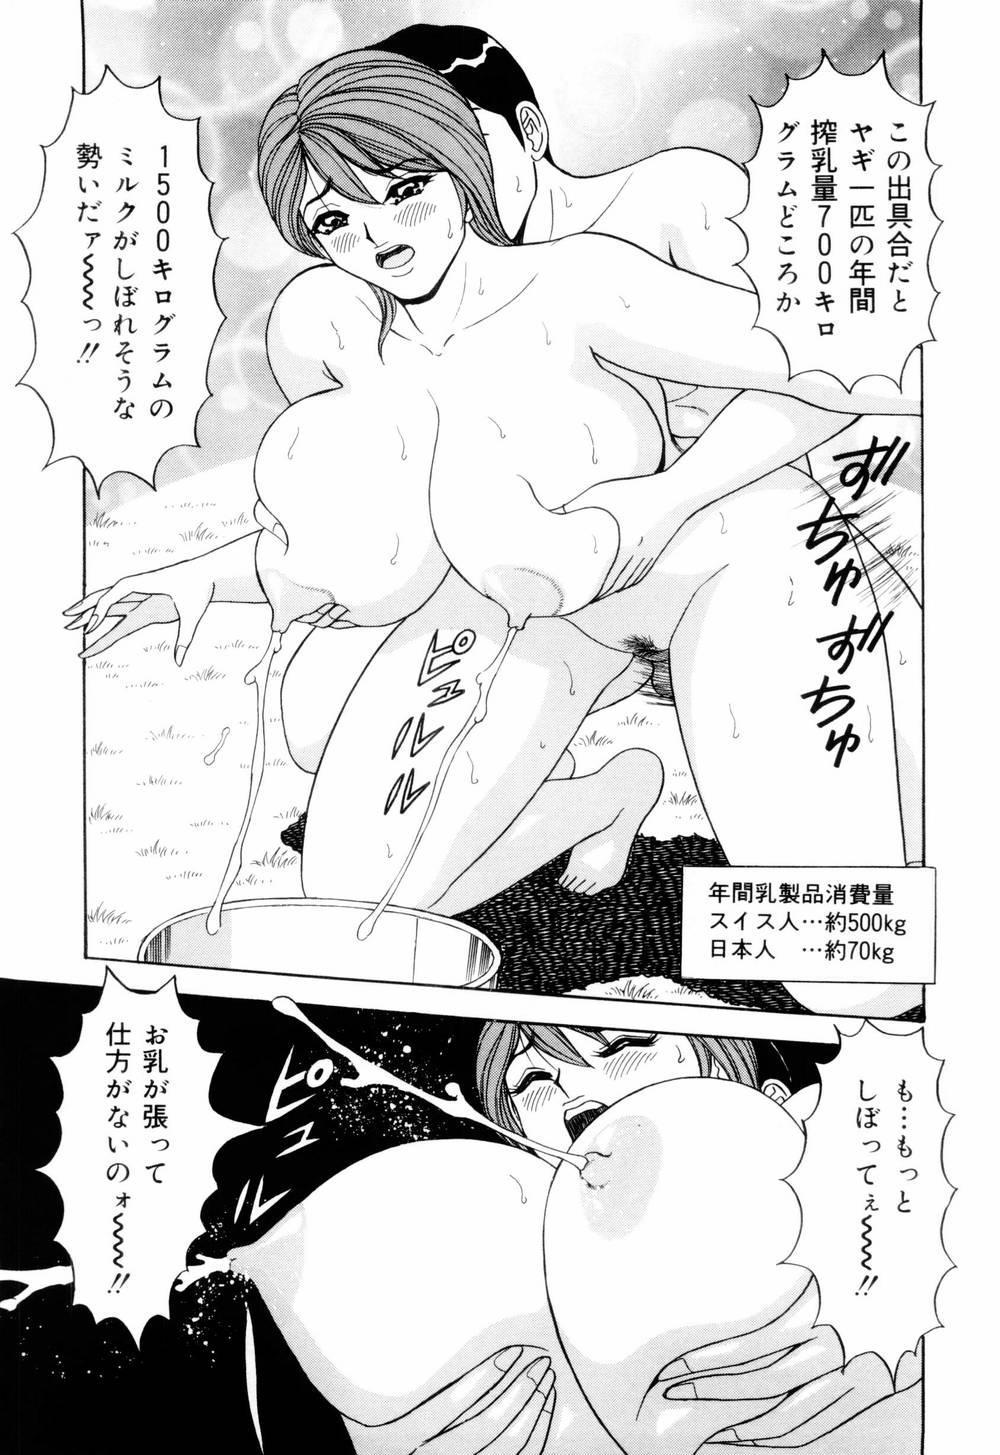 SuiCup Joshi Announcer Jikkyo Chukei Rape 120